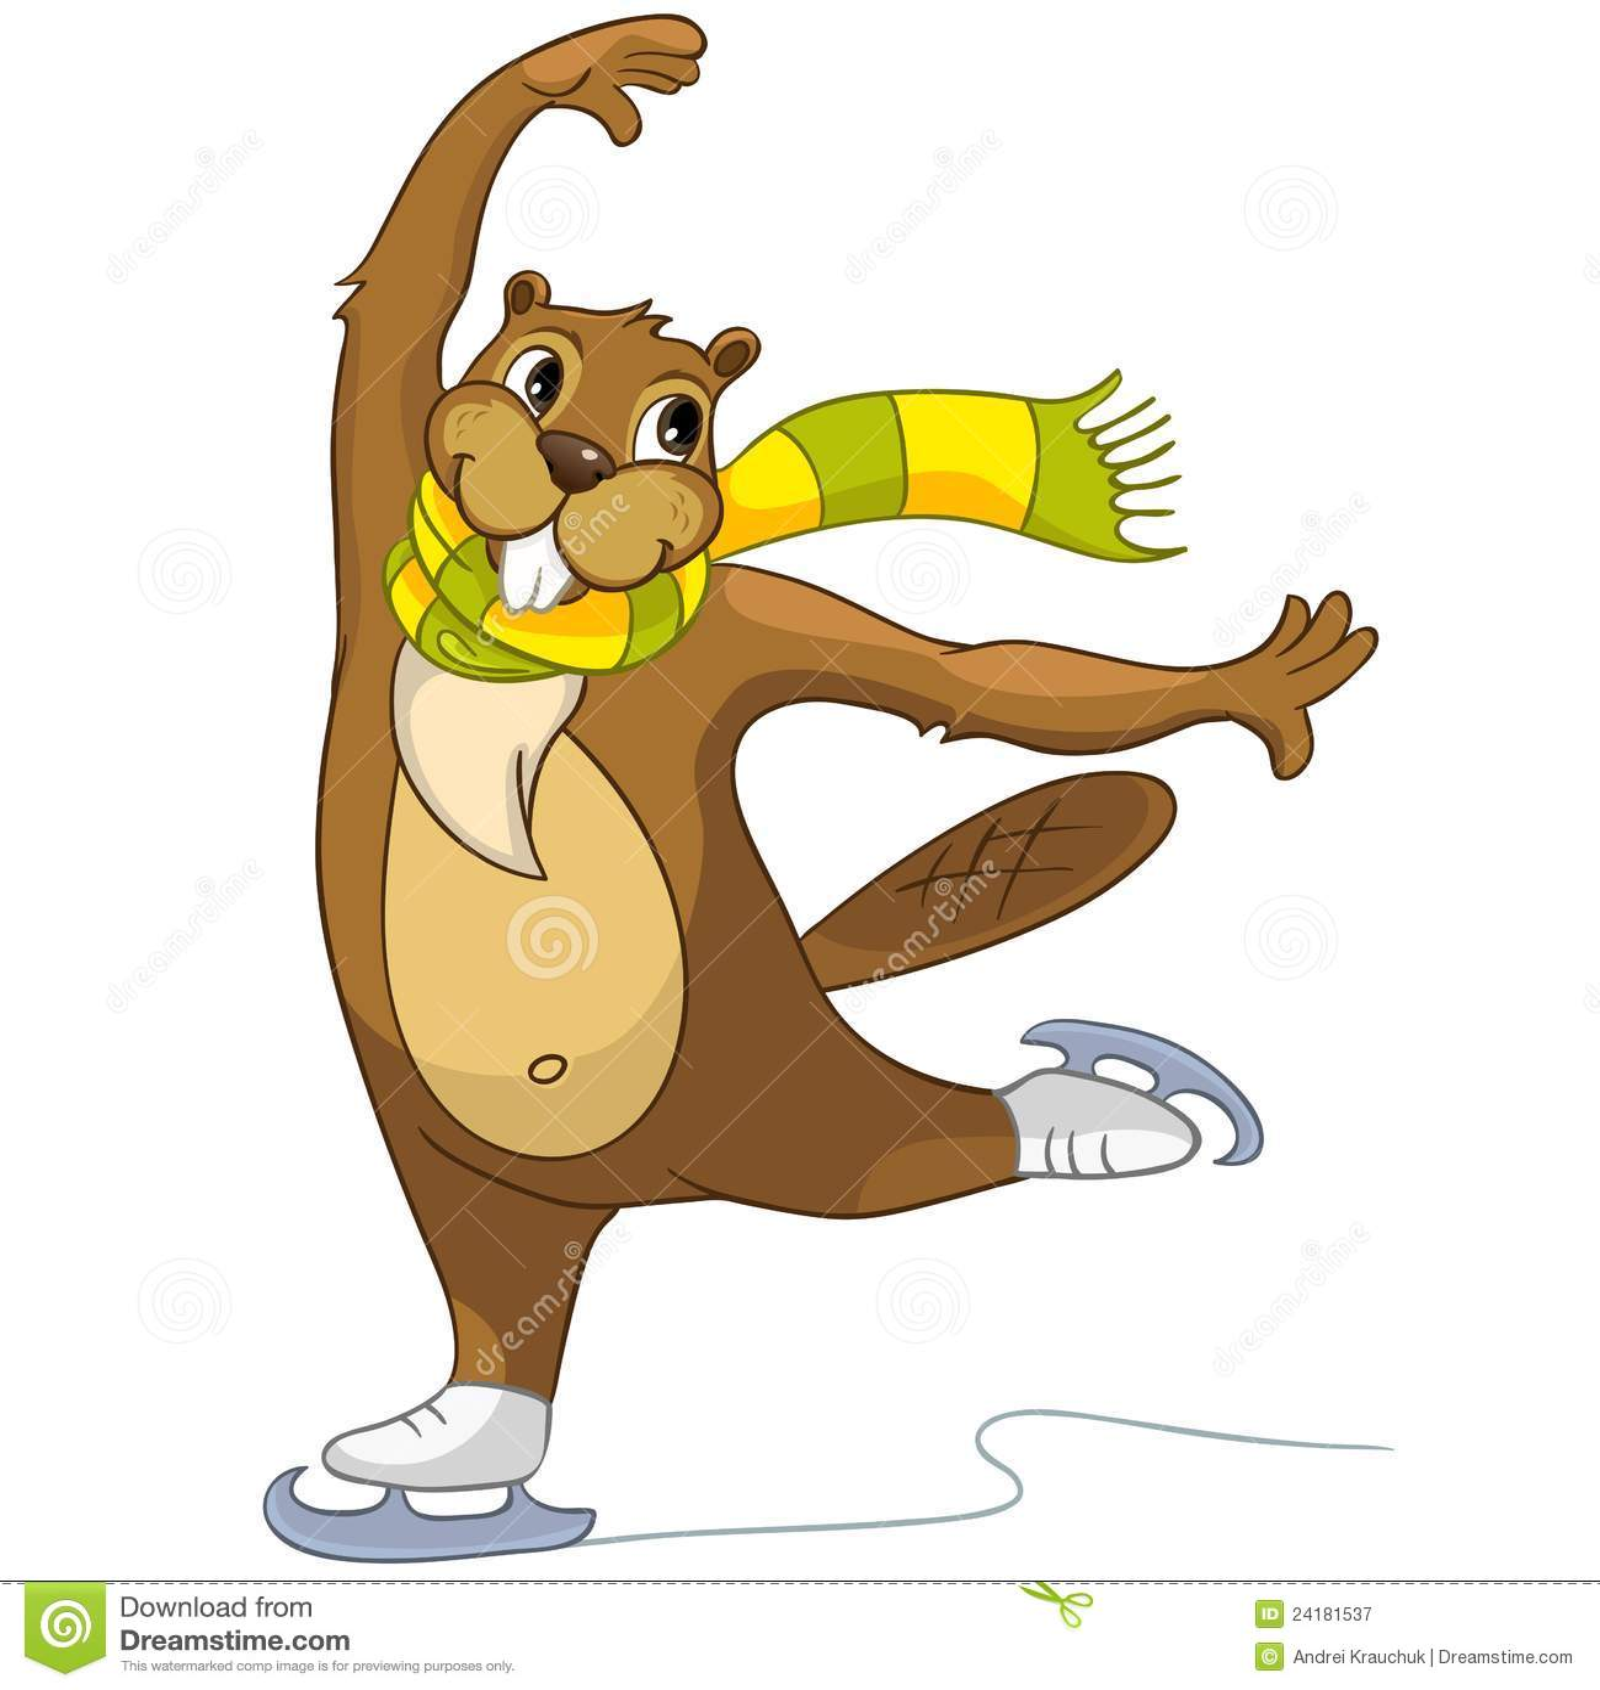 Beaver CREES stock vector. Illustration of glide, figure - 24181537